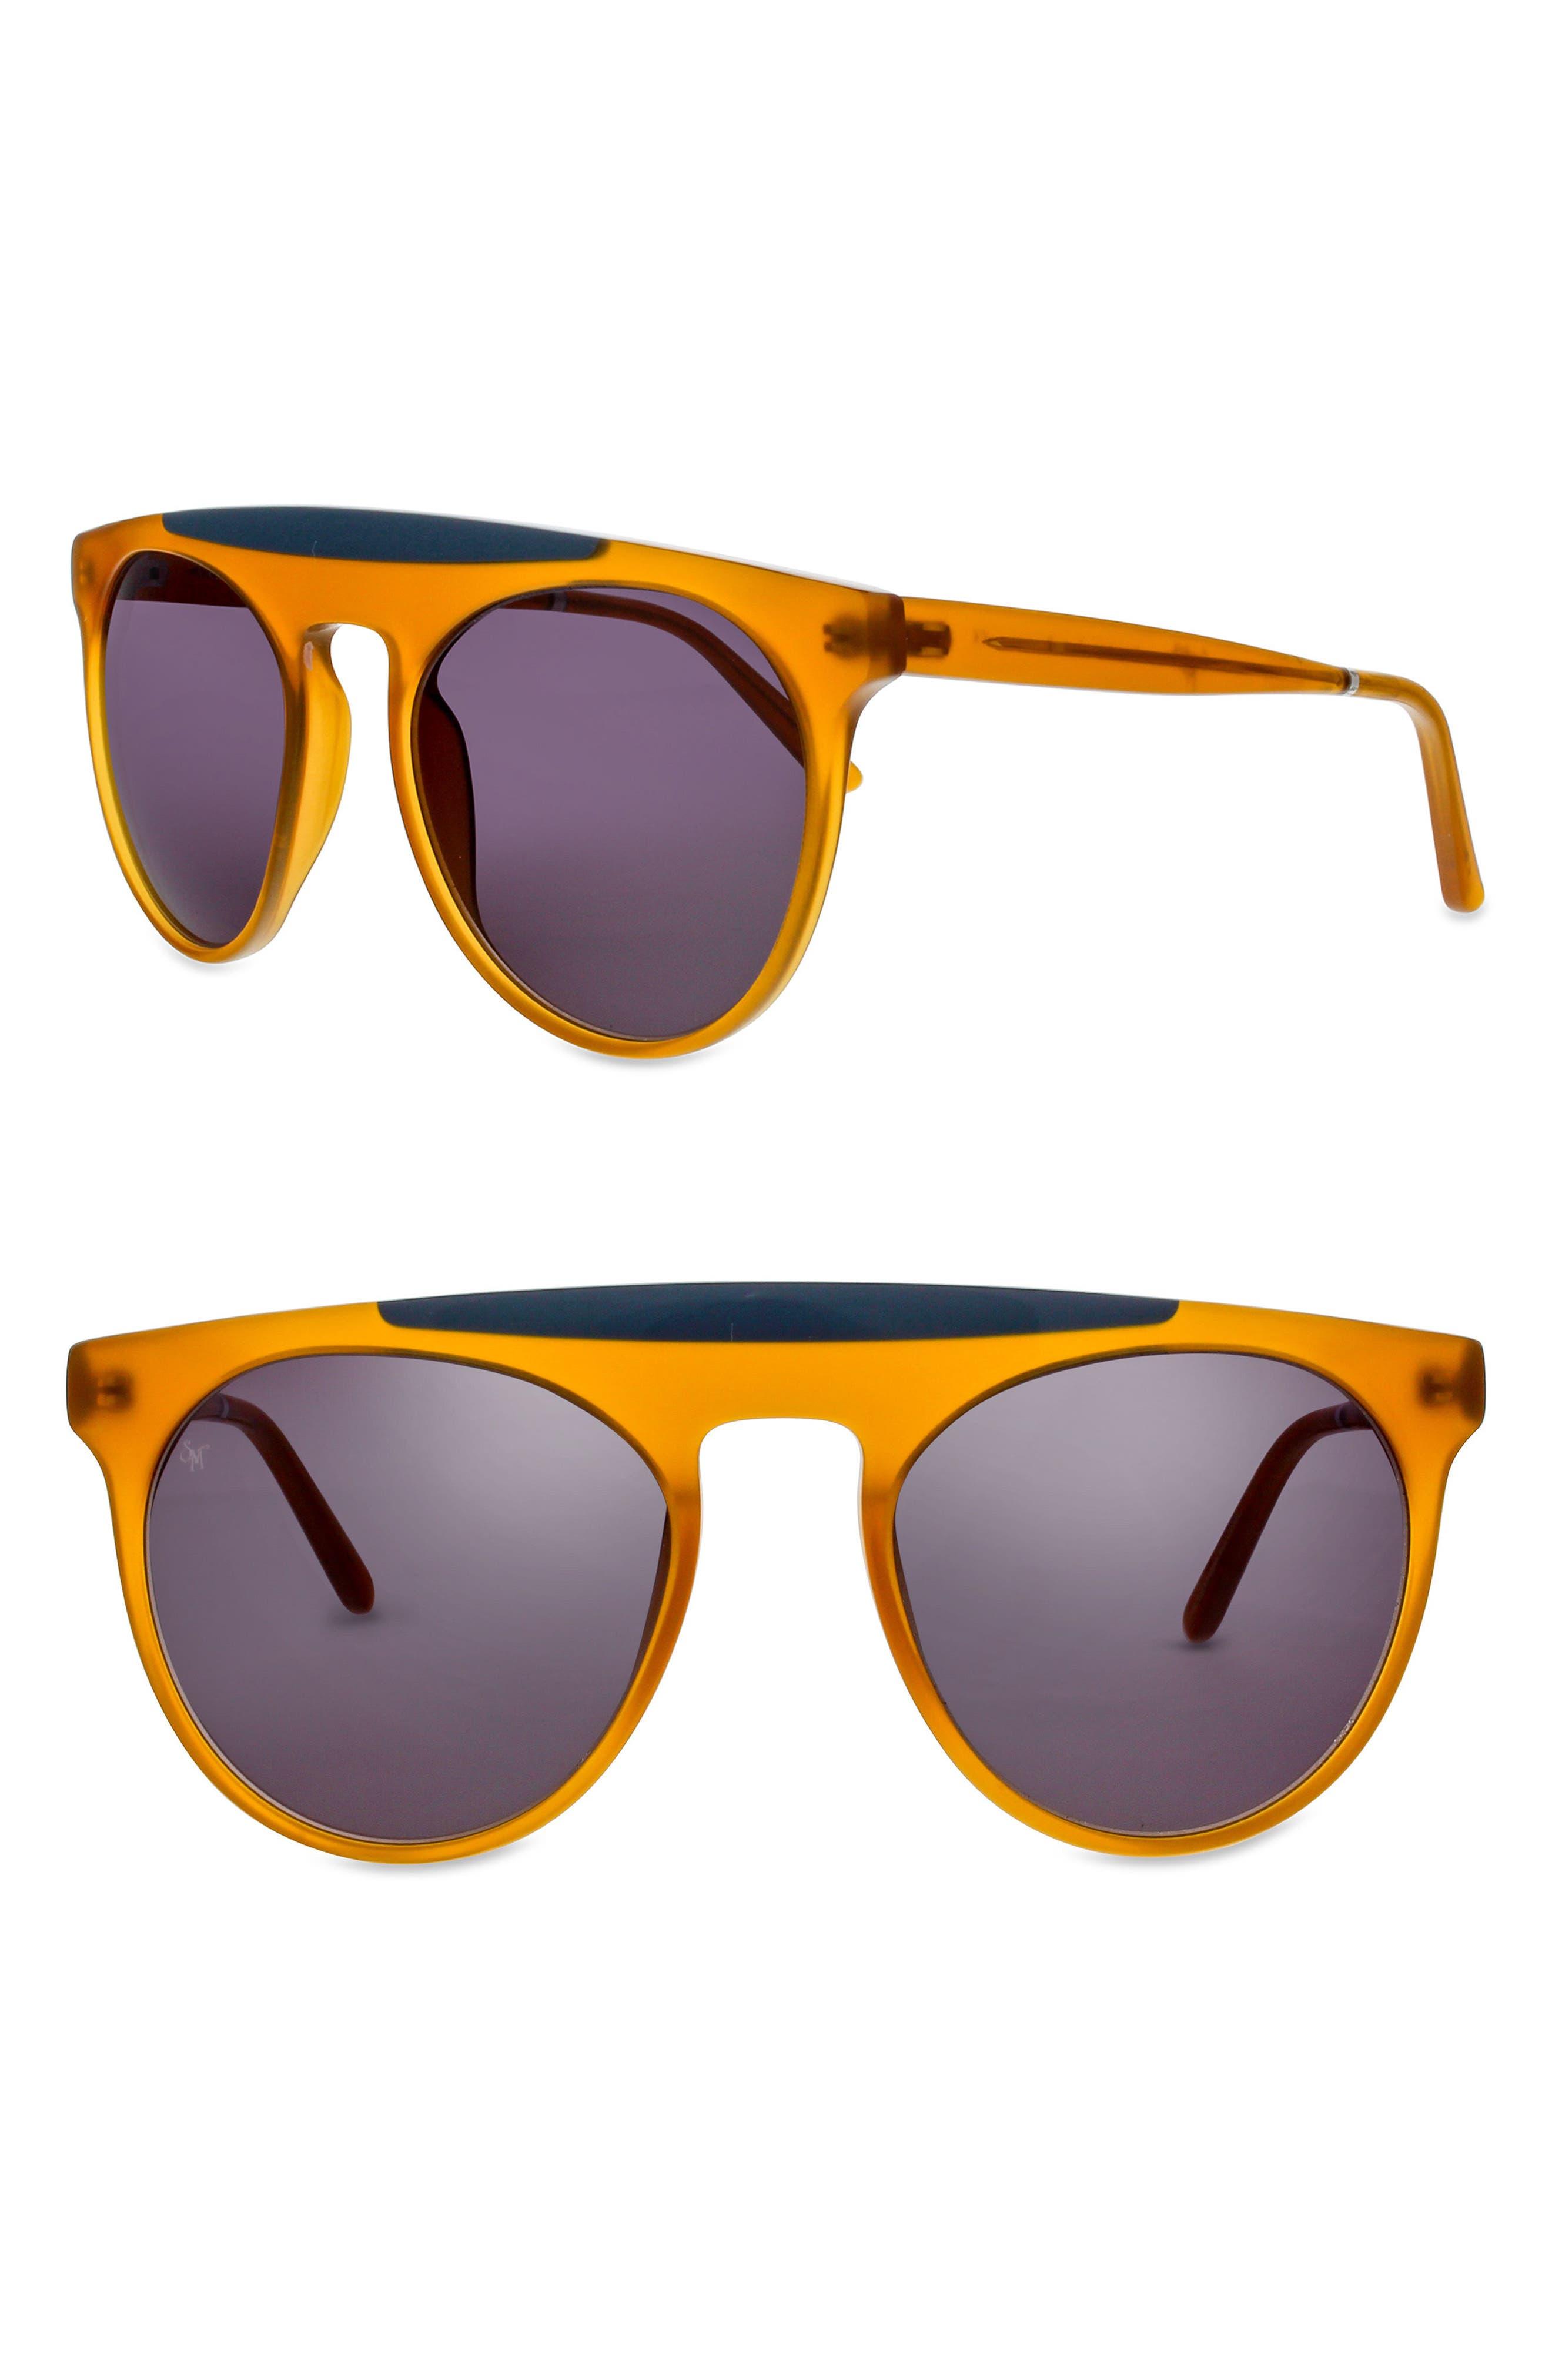 Atomic 52mm Round Sunglasses,                             Main thumbnail 1, color,                             MIEL- MILKY GREY